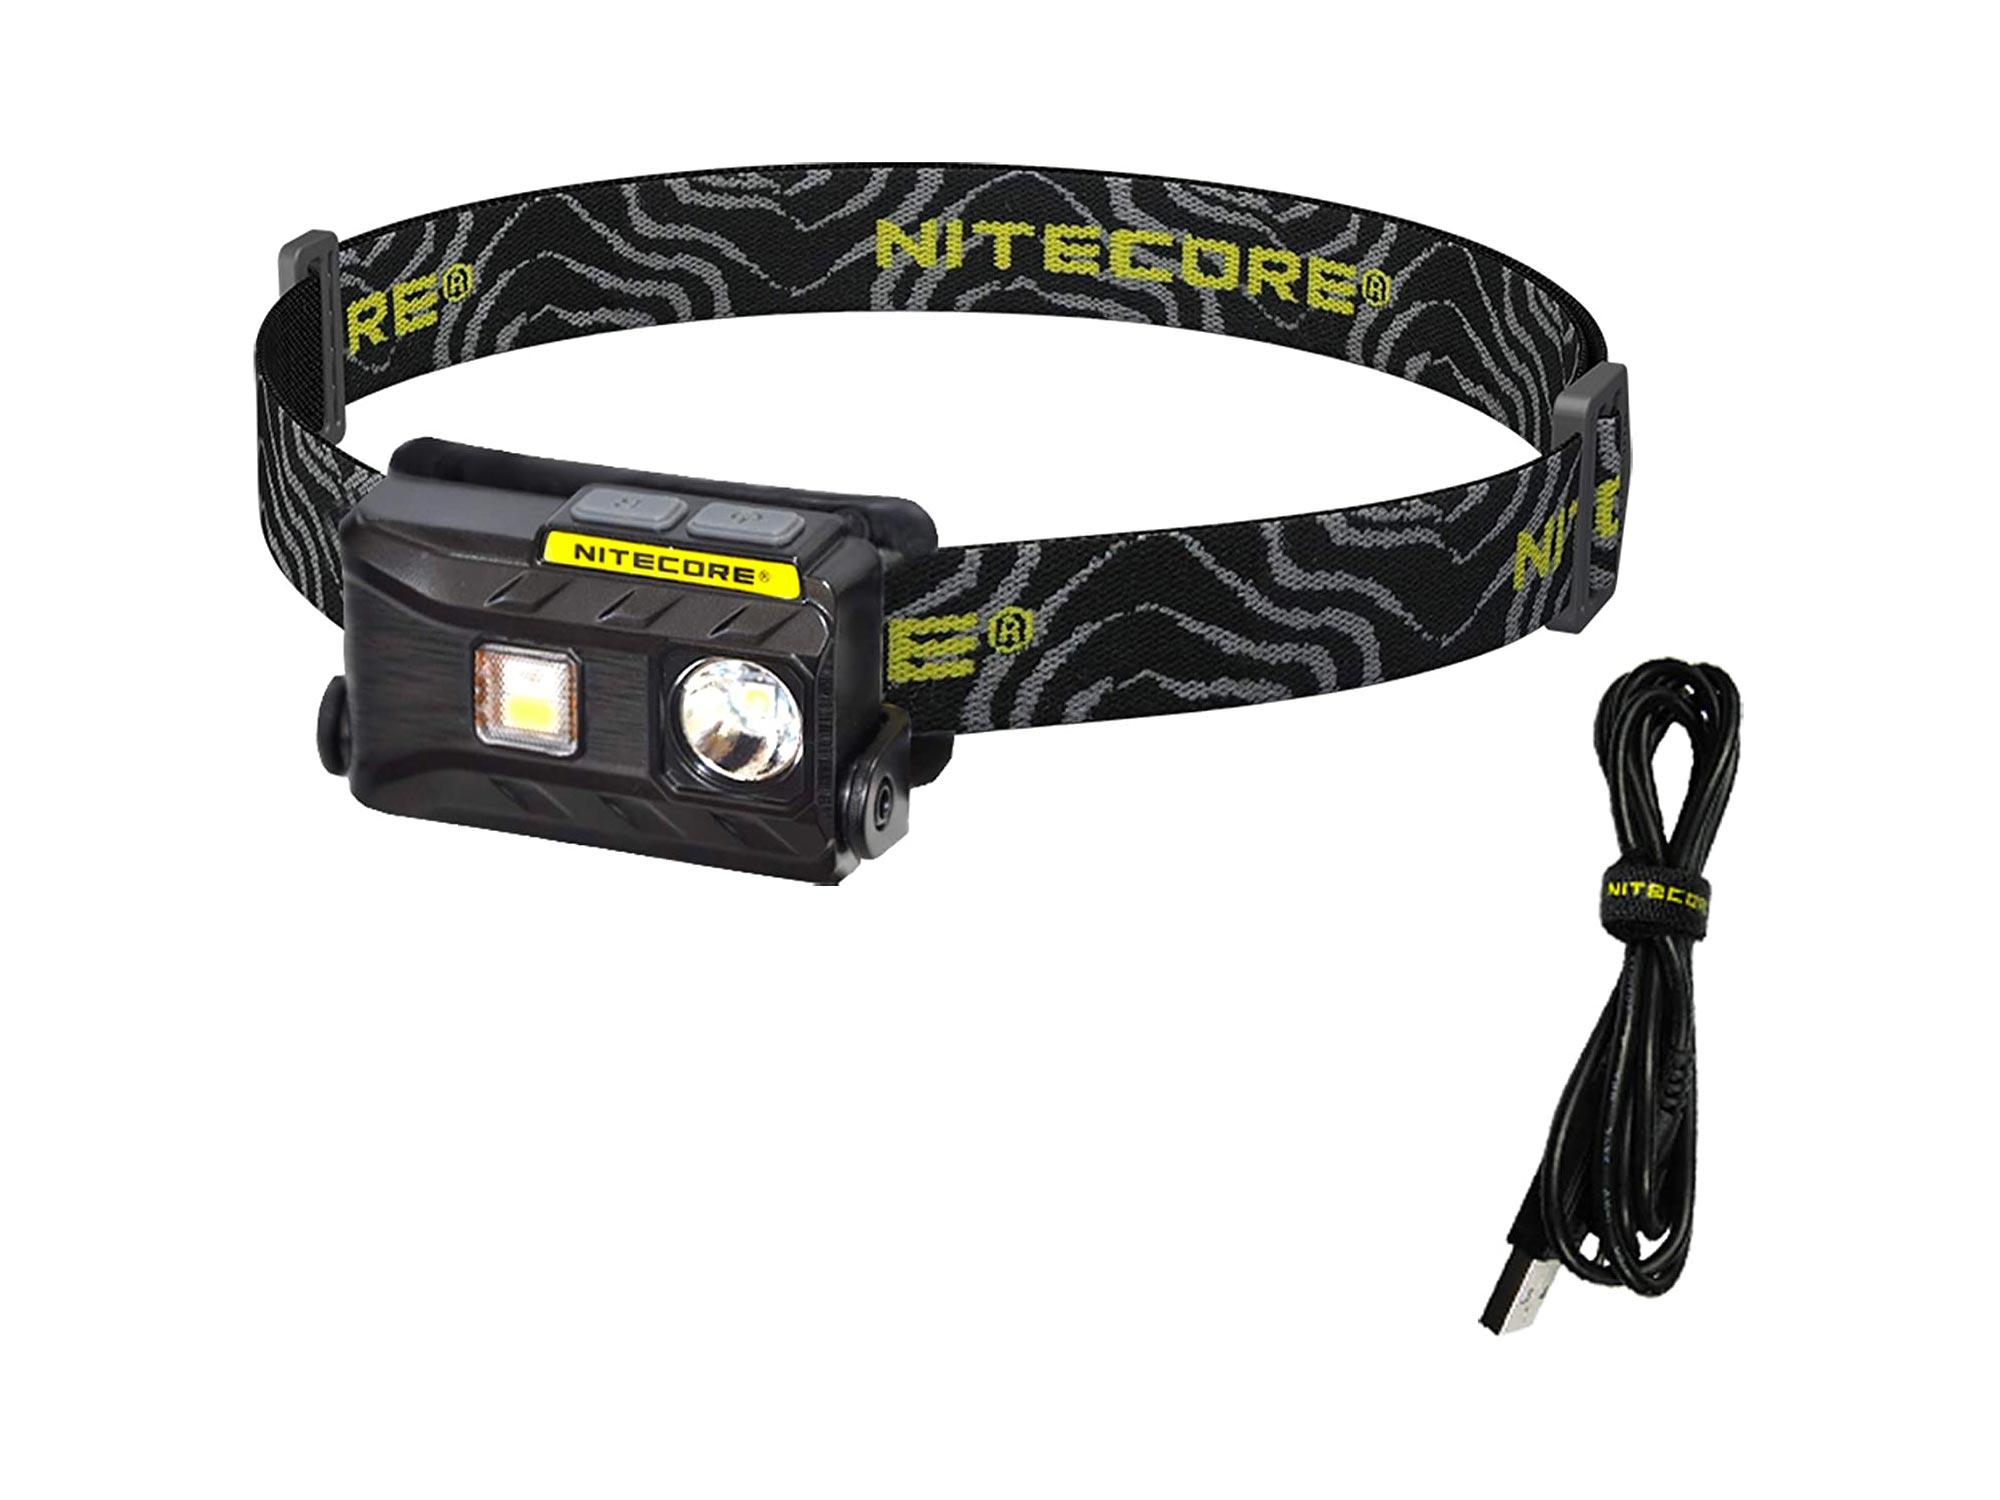 Nitecore NU25 360 Lumen Triple Output Headlamp